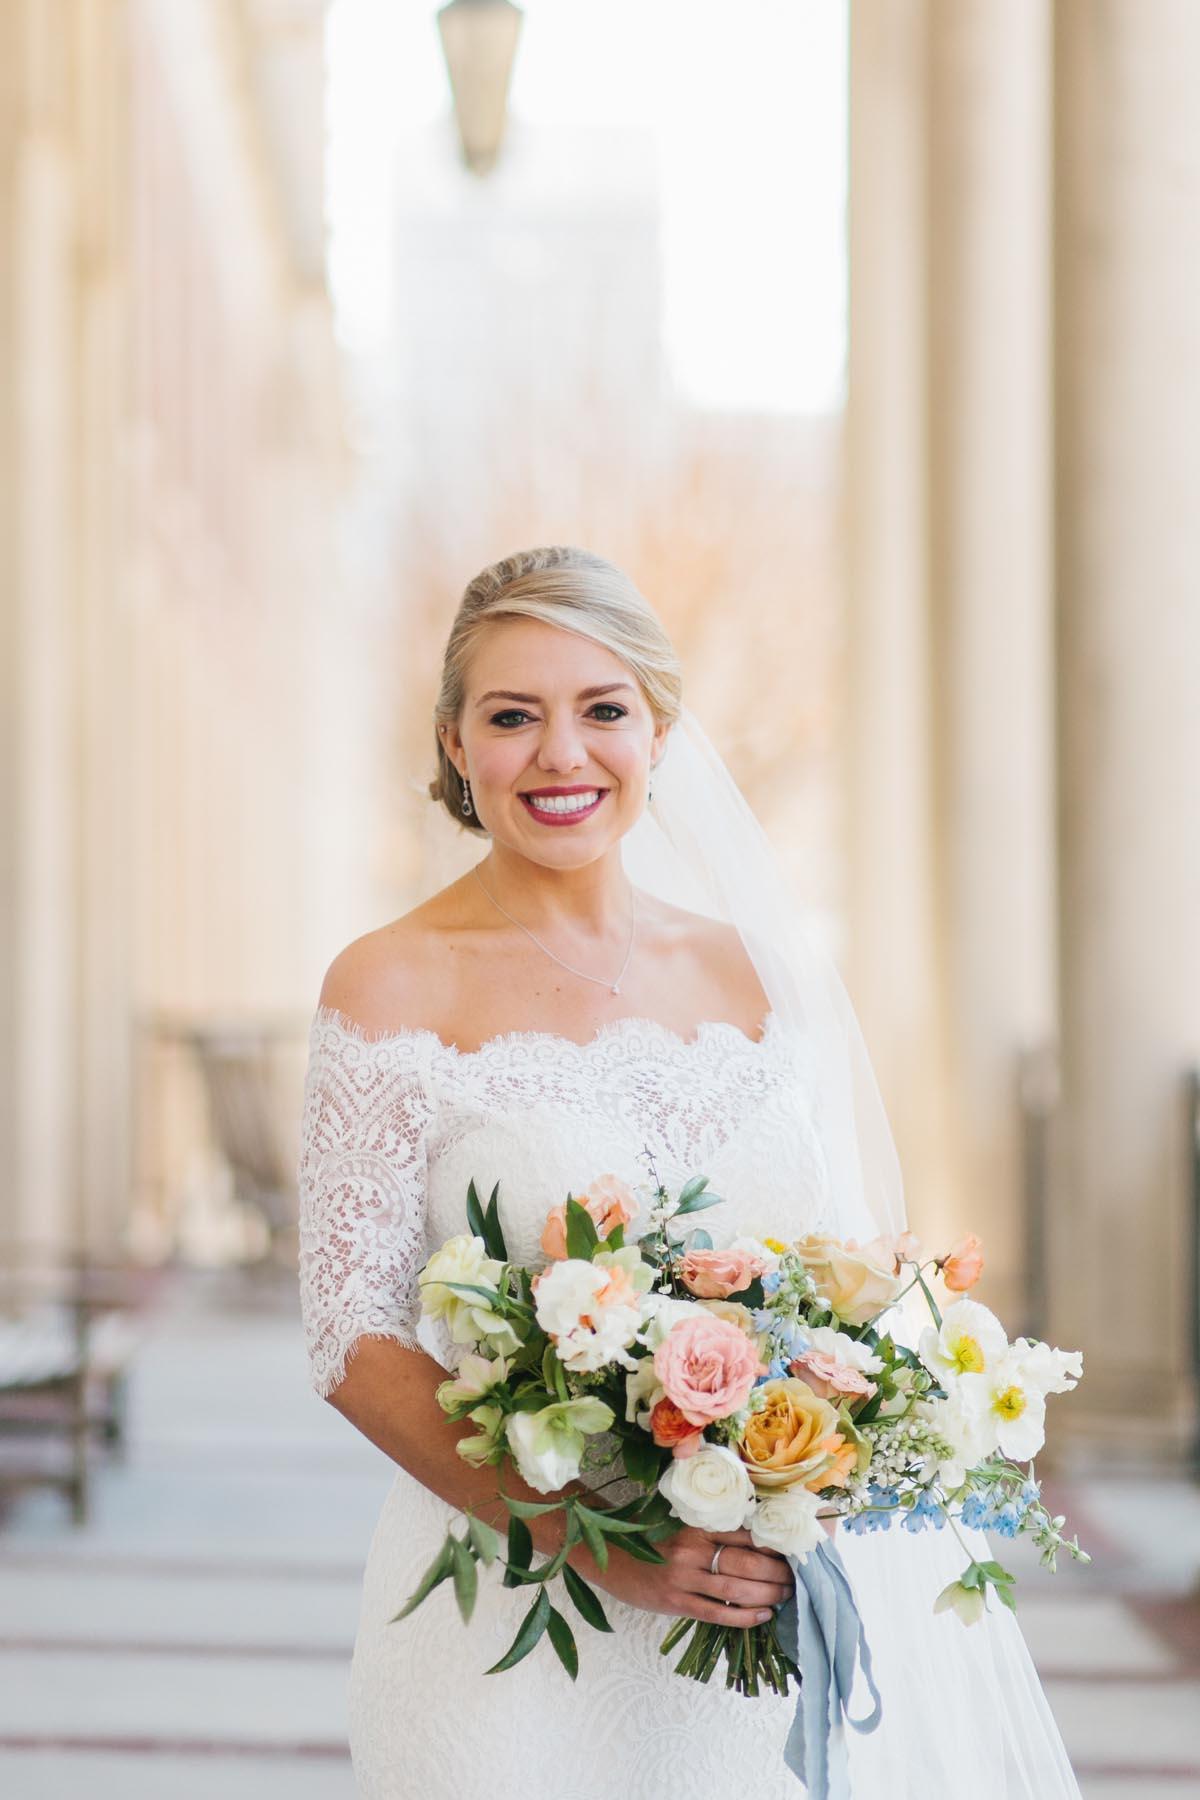 kjellman wedding blog biltmore wedding -47